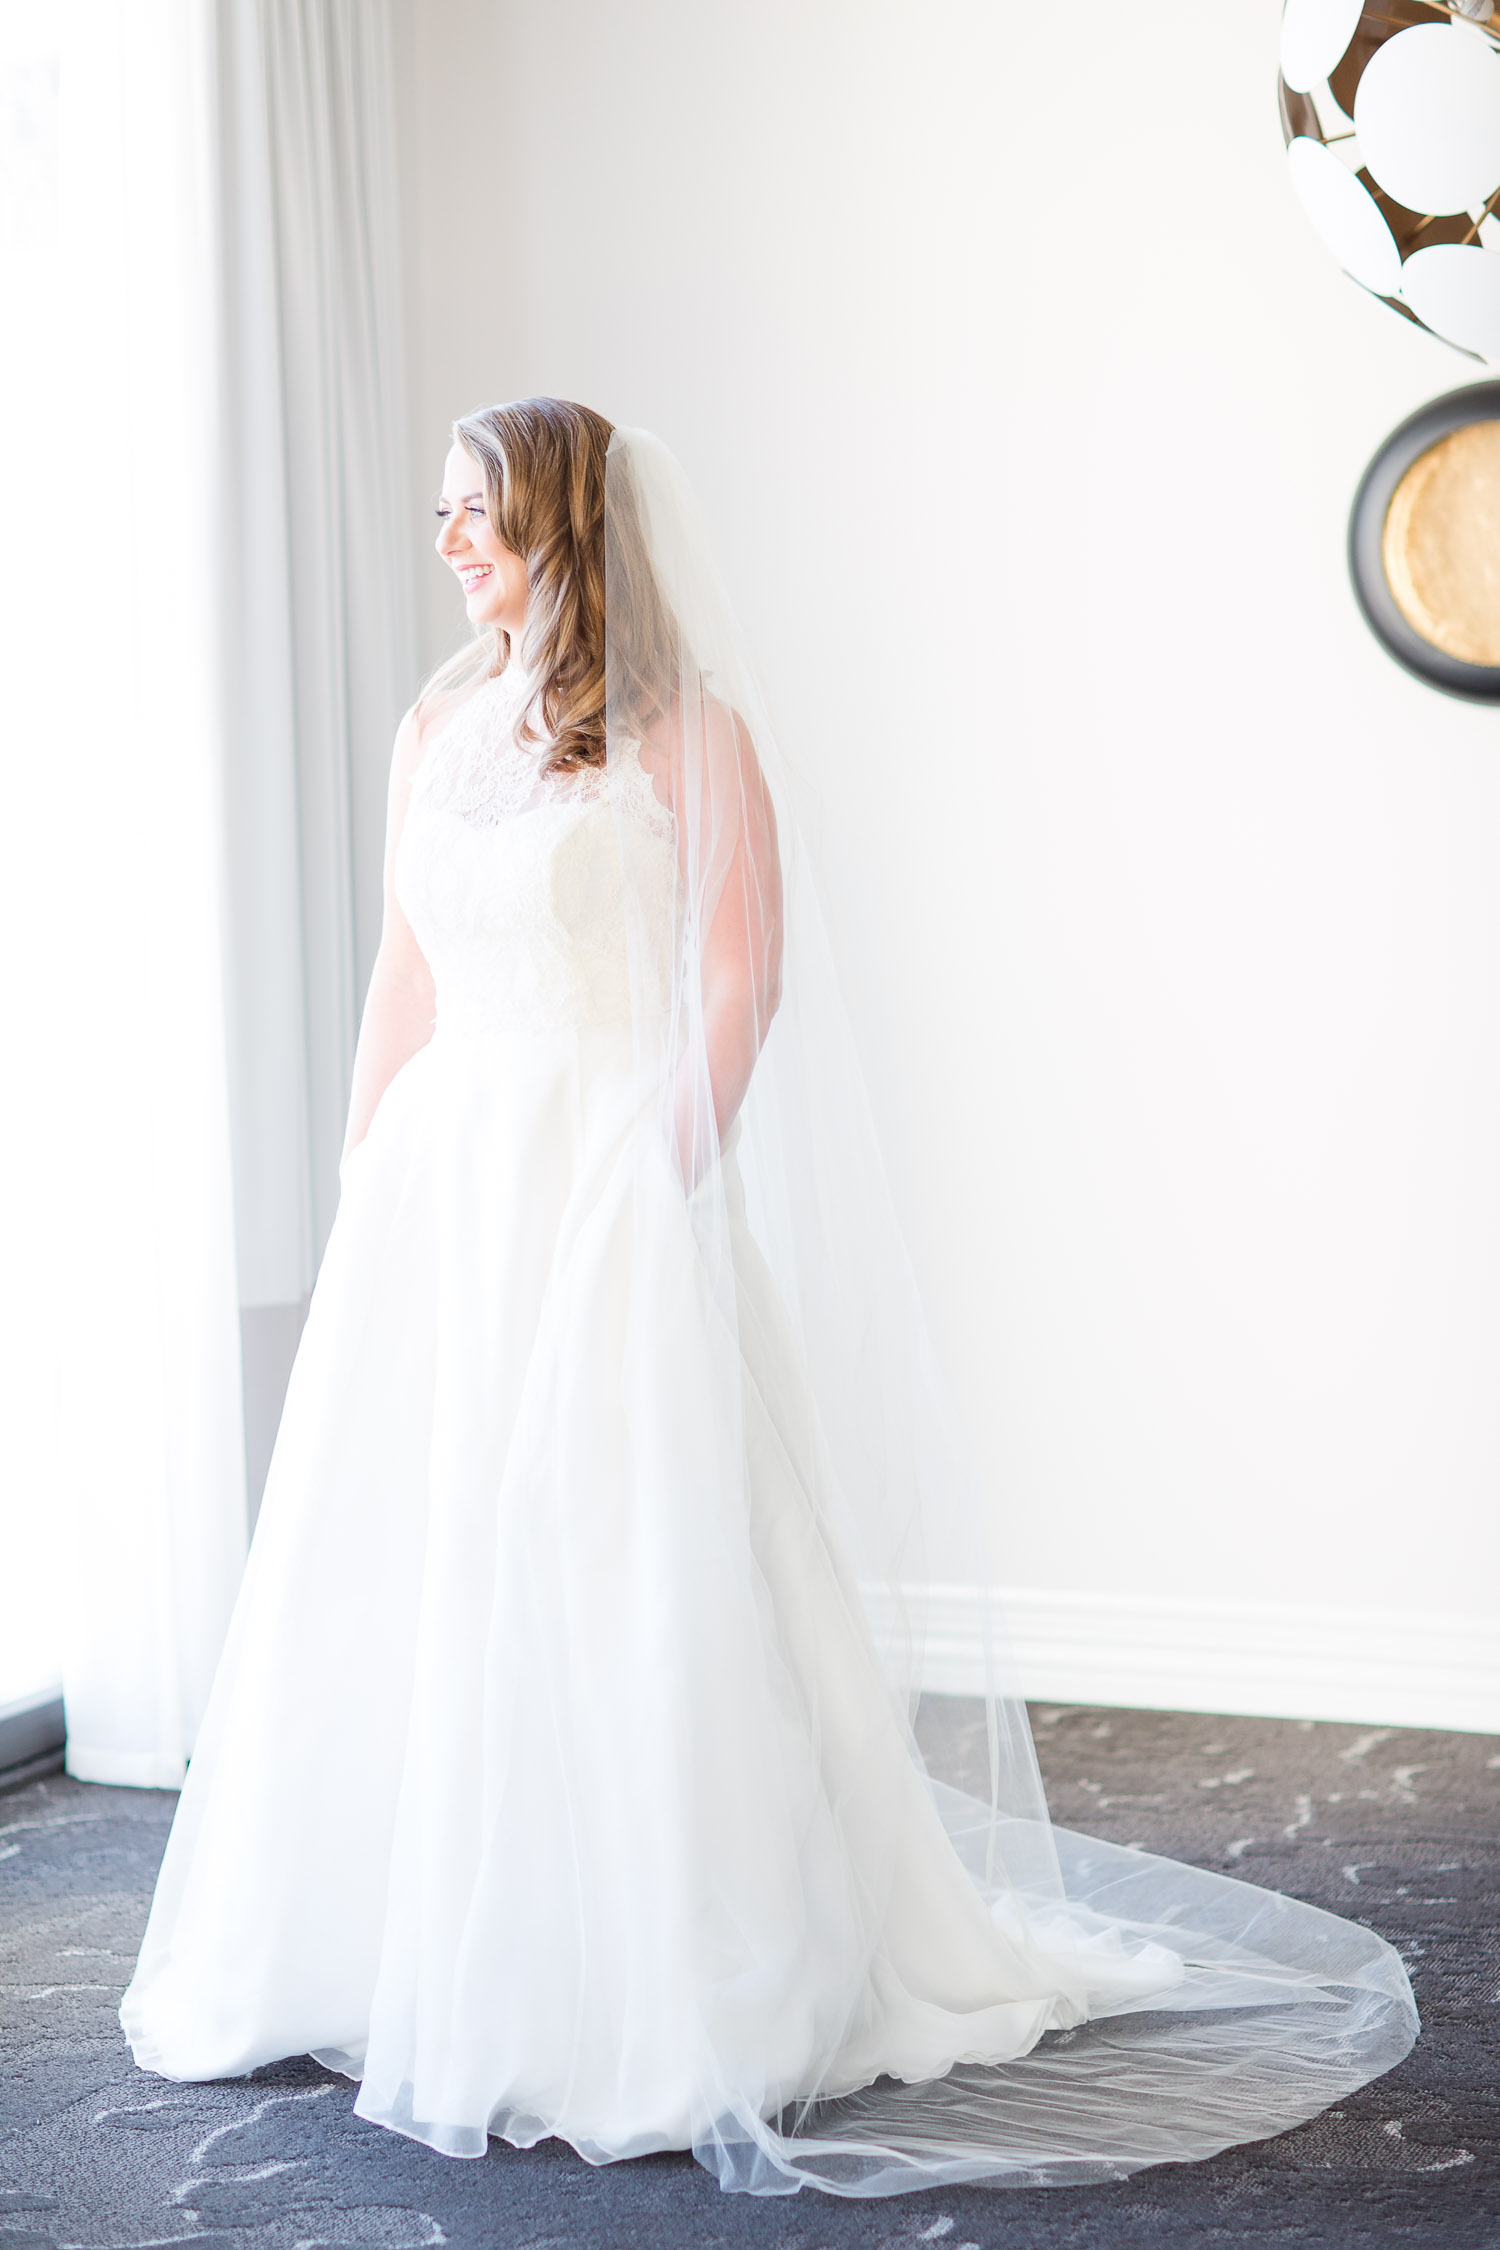 AL Weddings in Birmingham Wedding Photographer-024.jpg